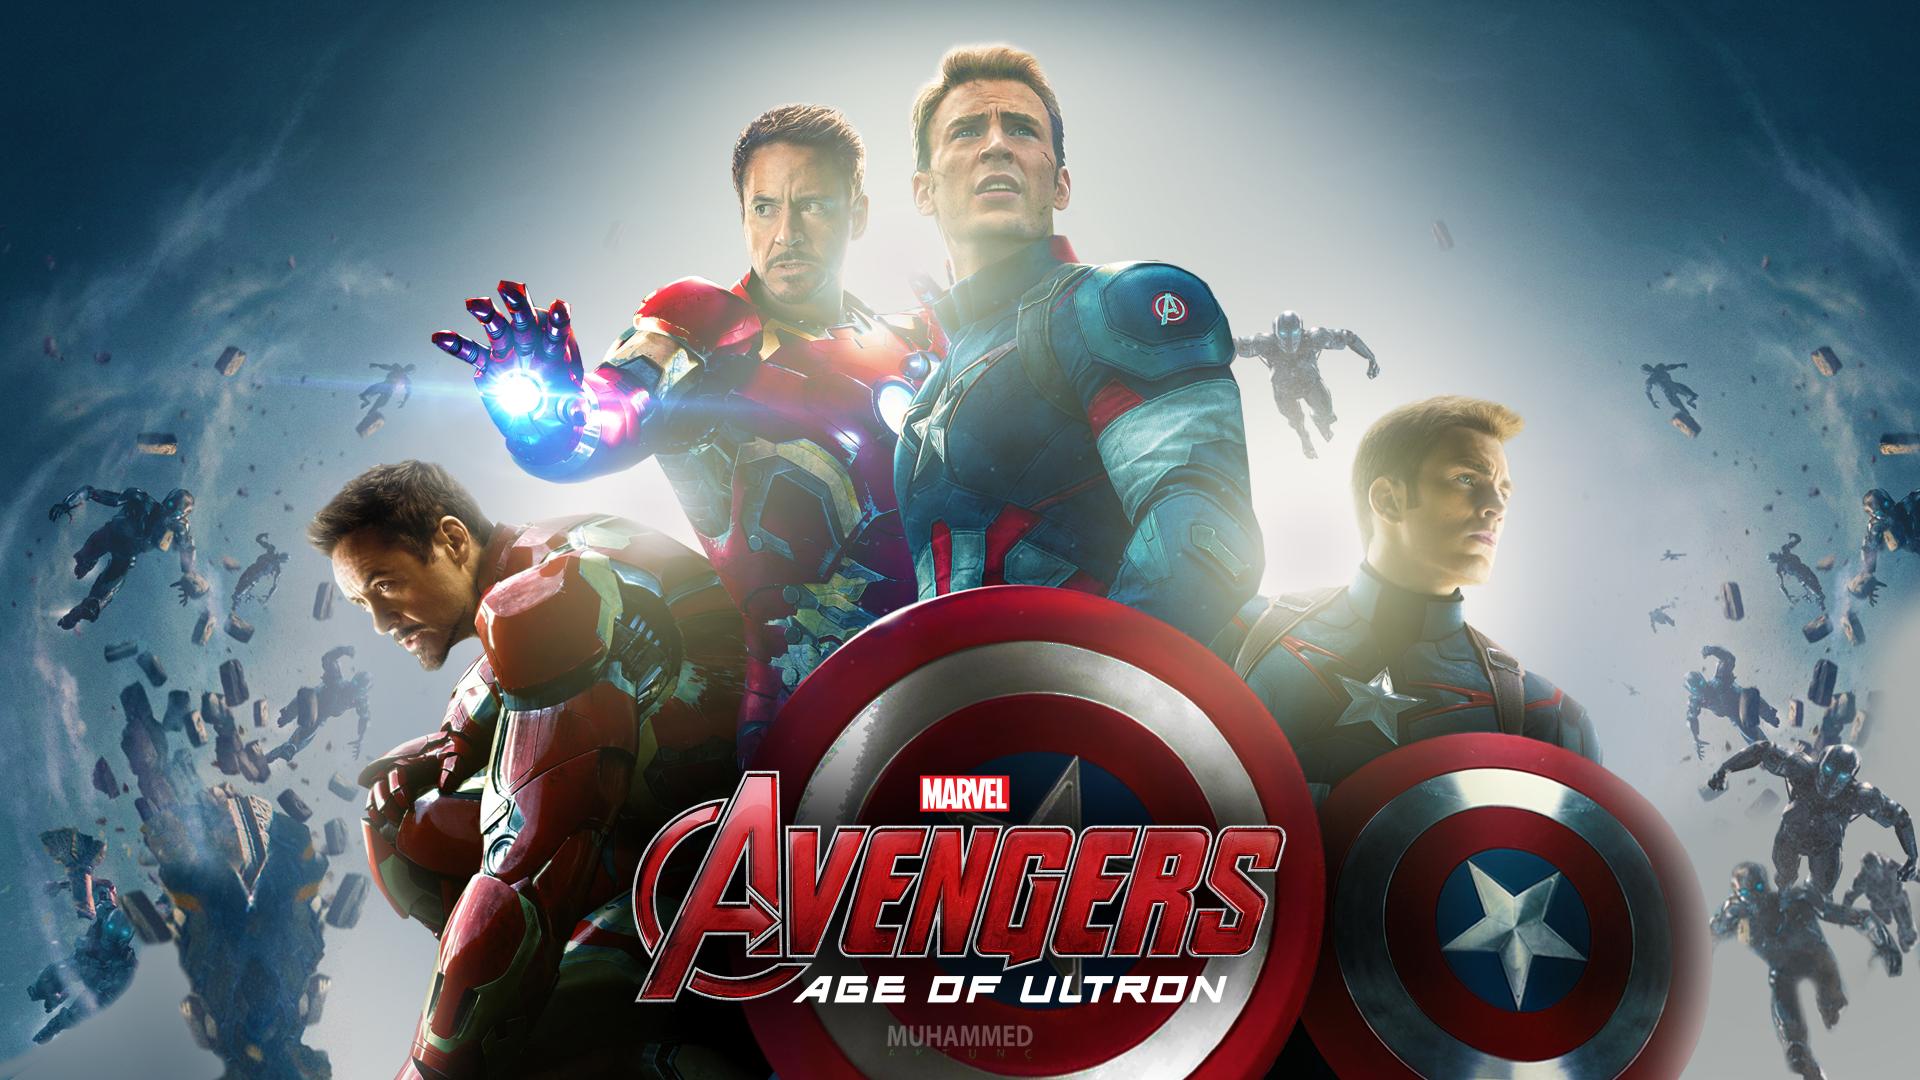 MARVELs Avengers Age of Ultron HD Wallpaper by muhammedaktunc on 1920x1080